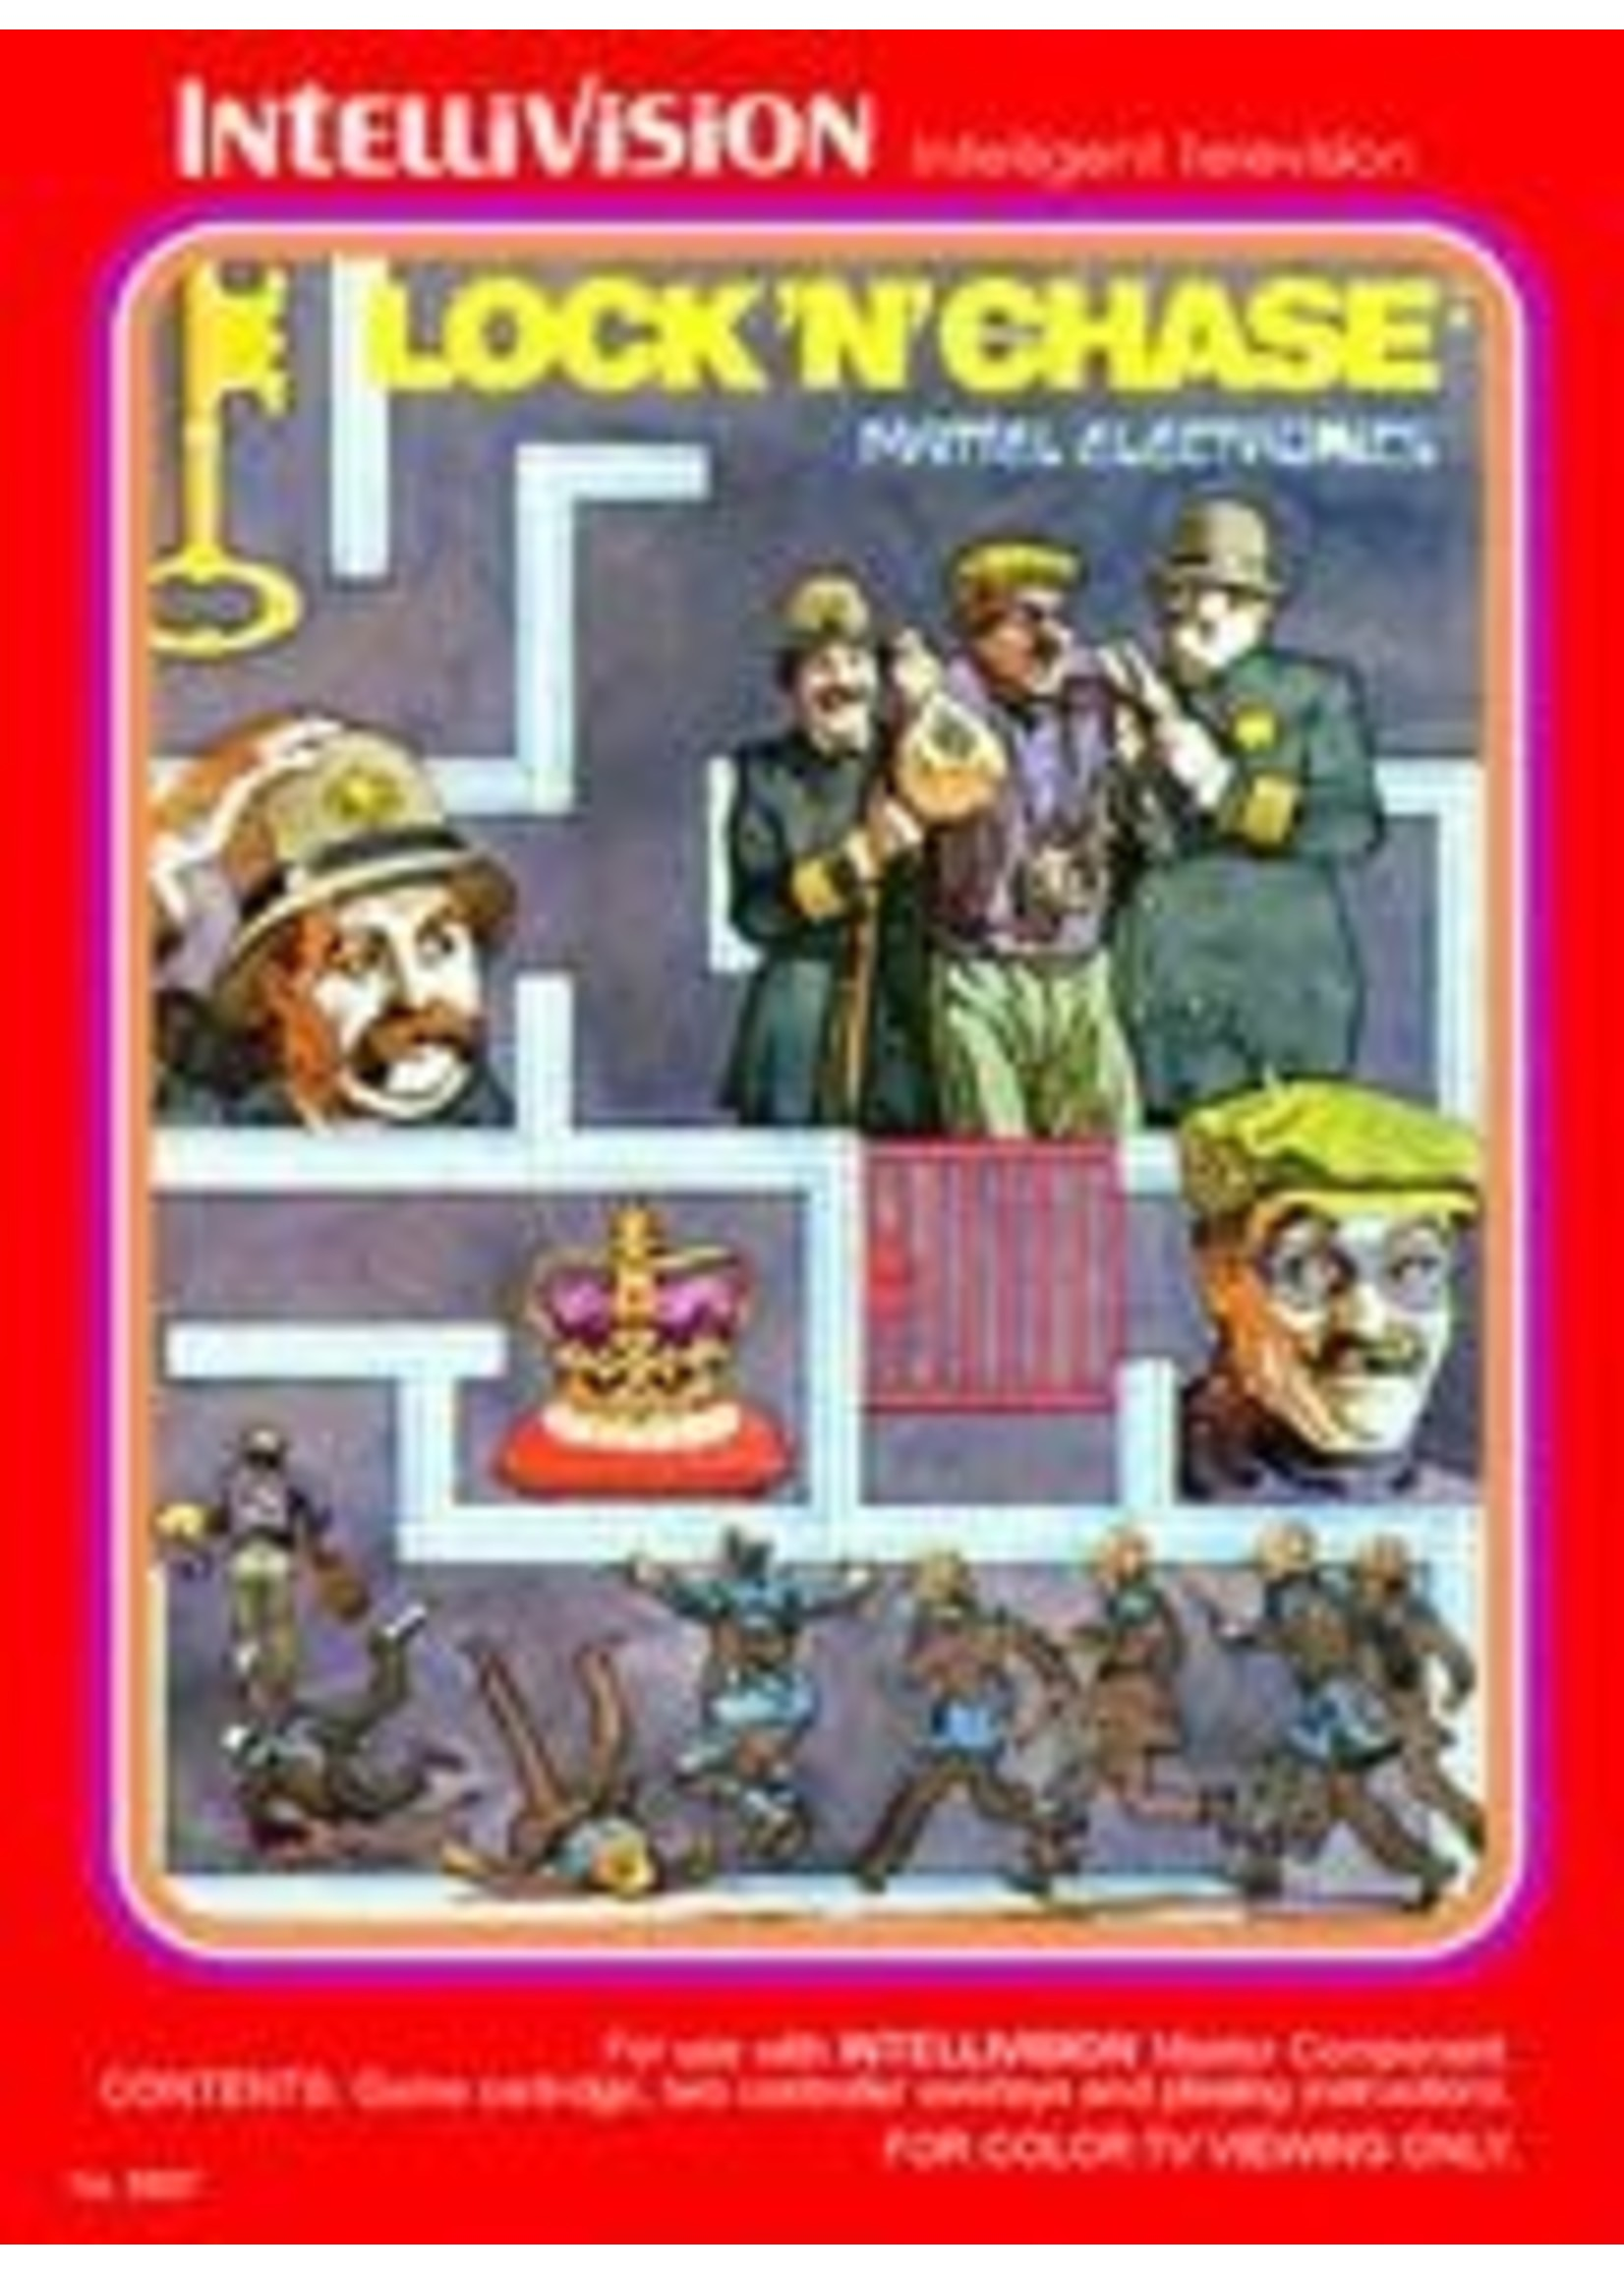 Lock 'N Chase Intellivision